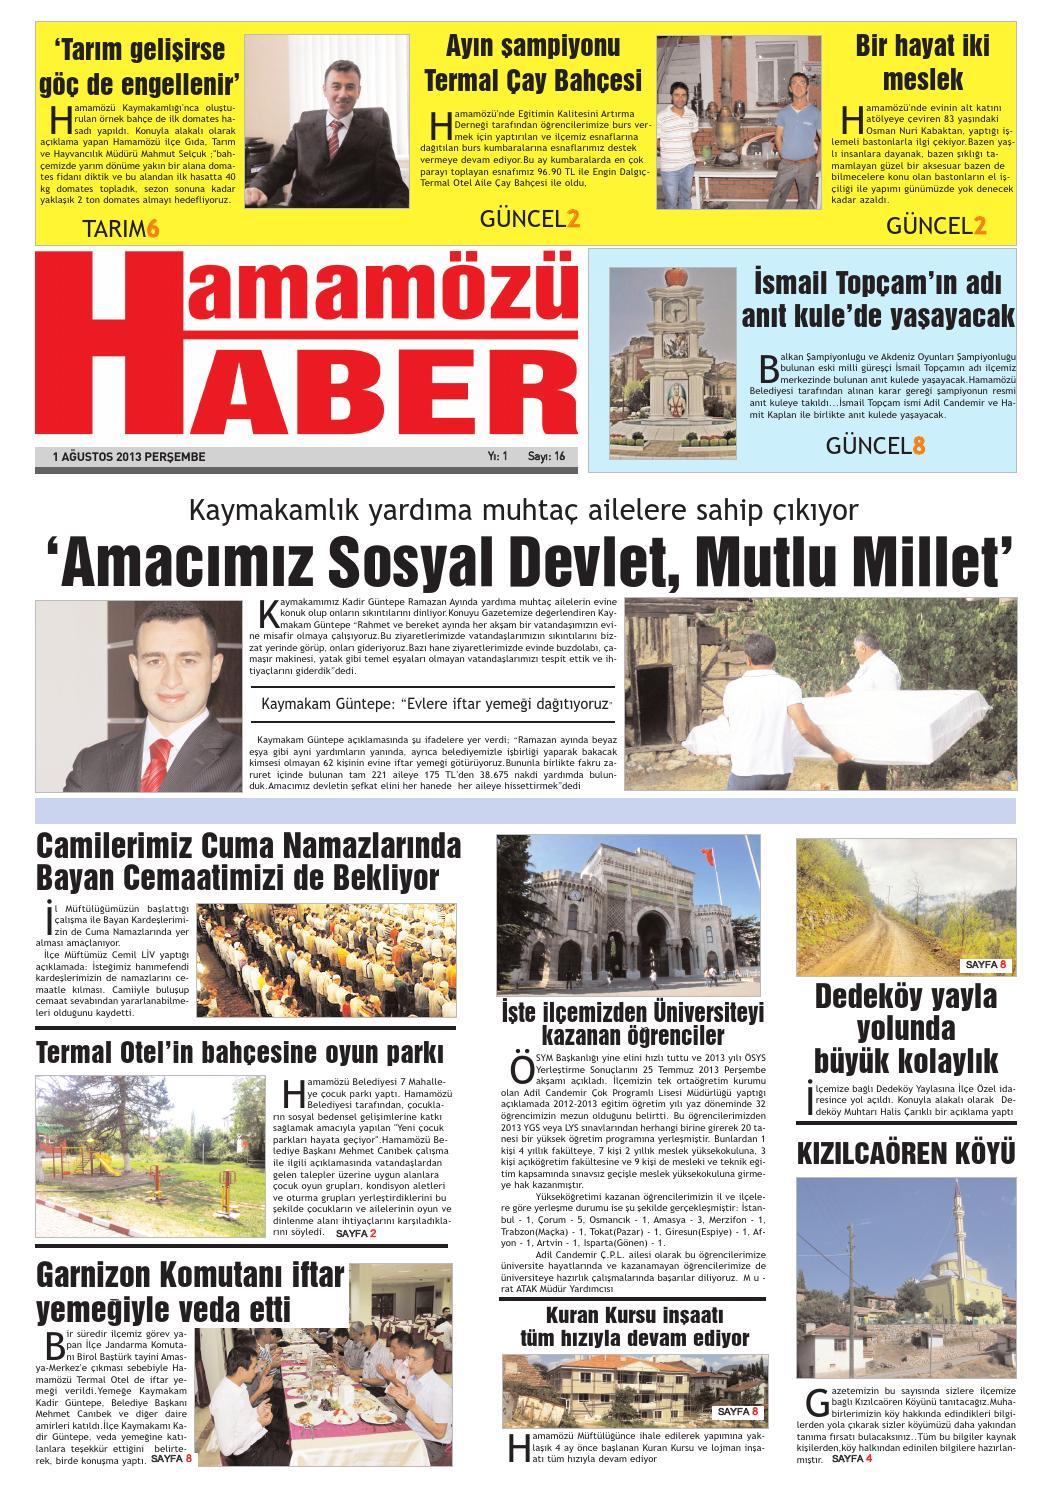 Gazete 16 1 By Halil Kartal Issuu